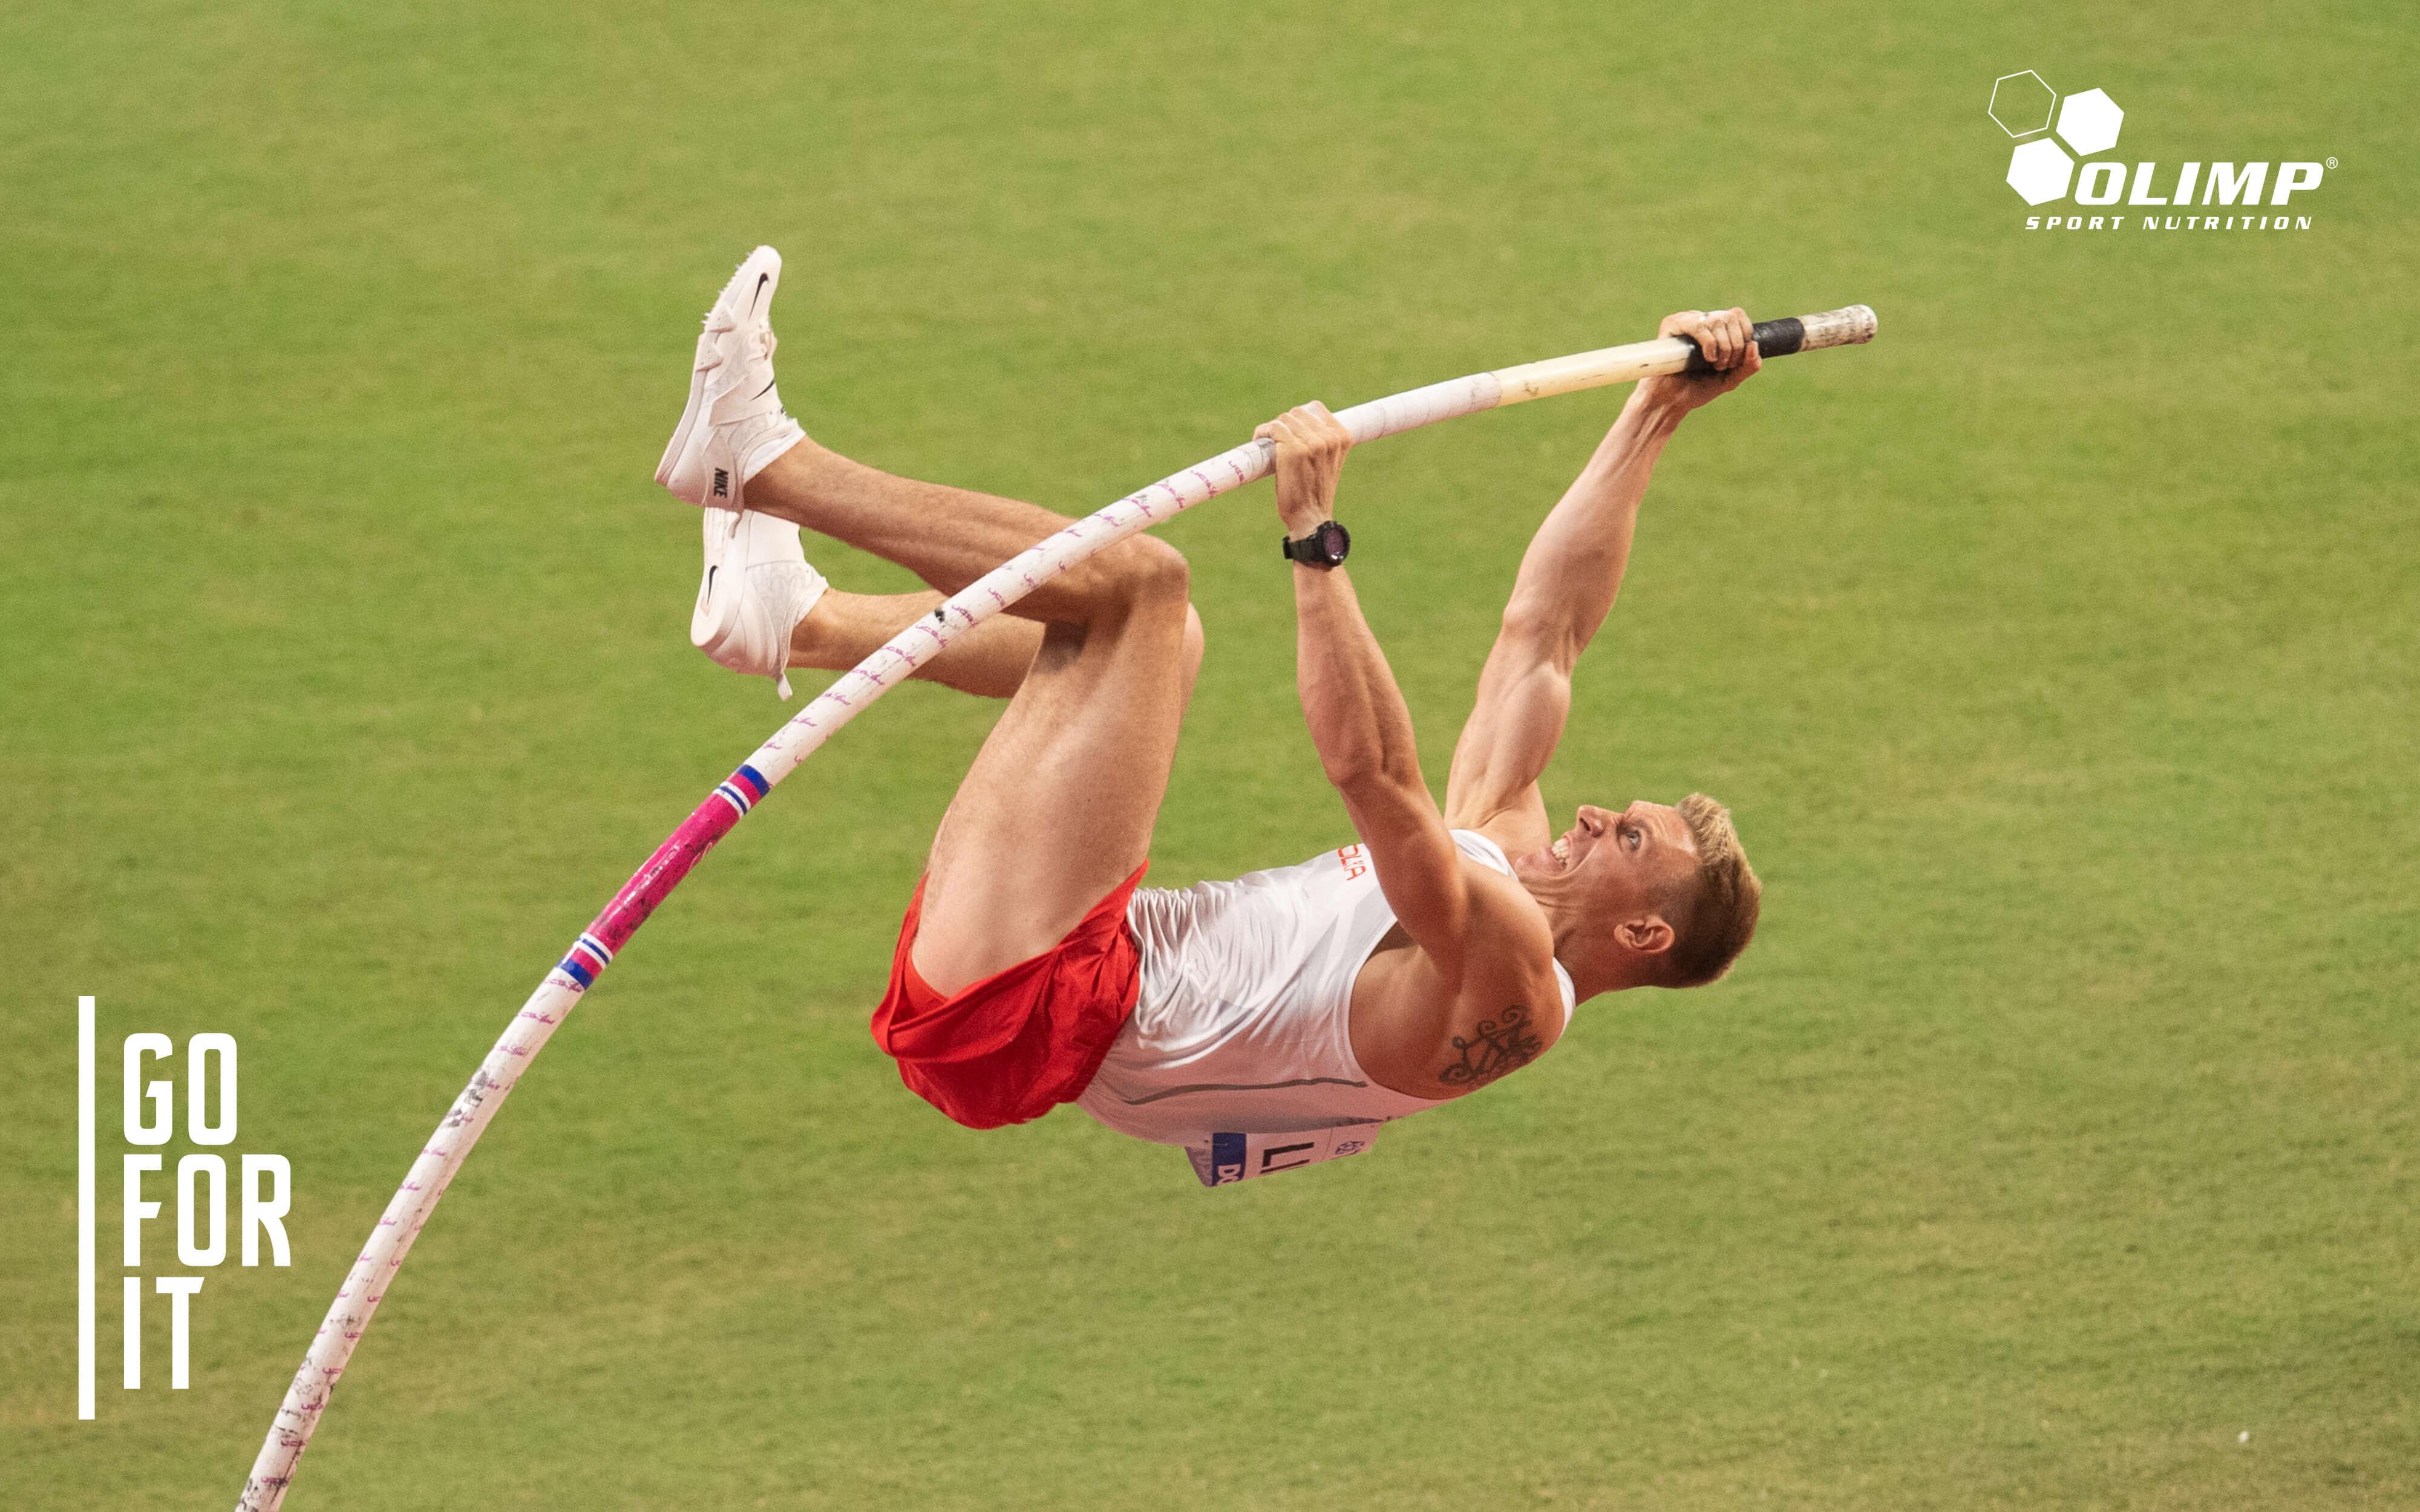 Piotr Lisek  joins the Olimp Team!